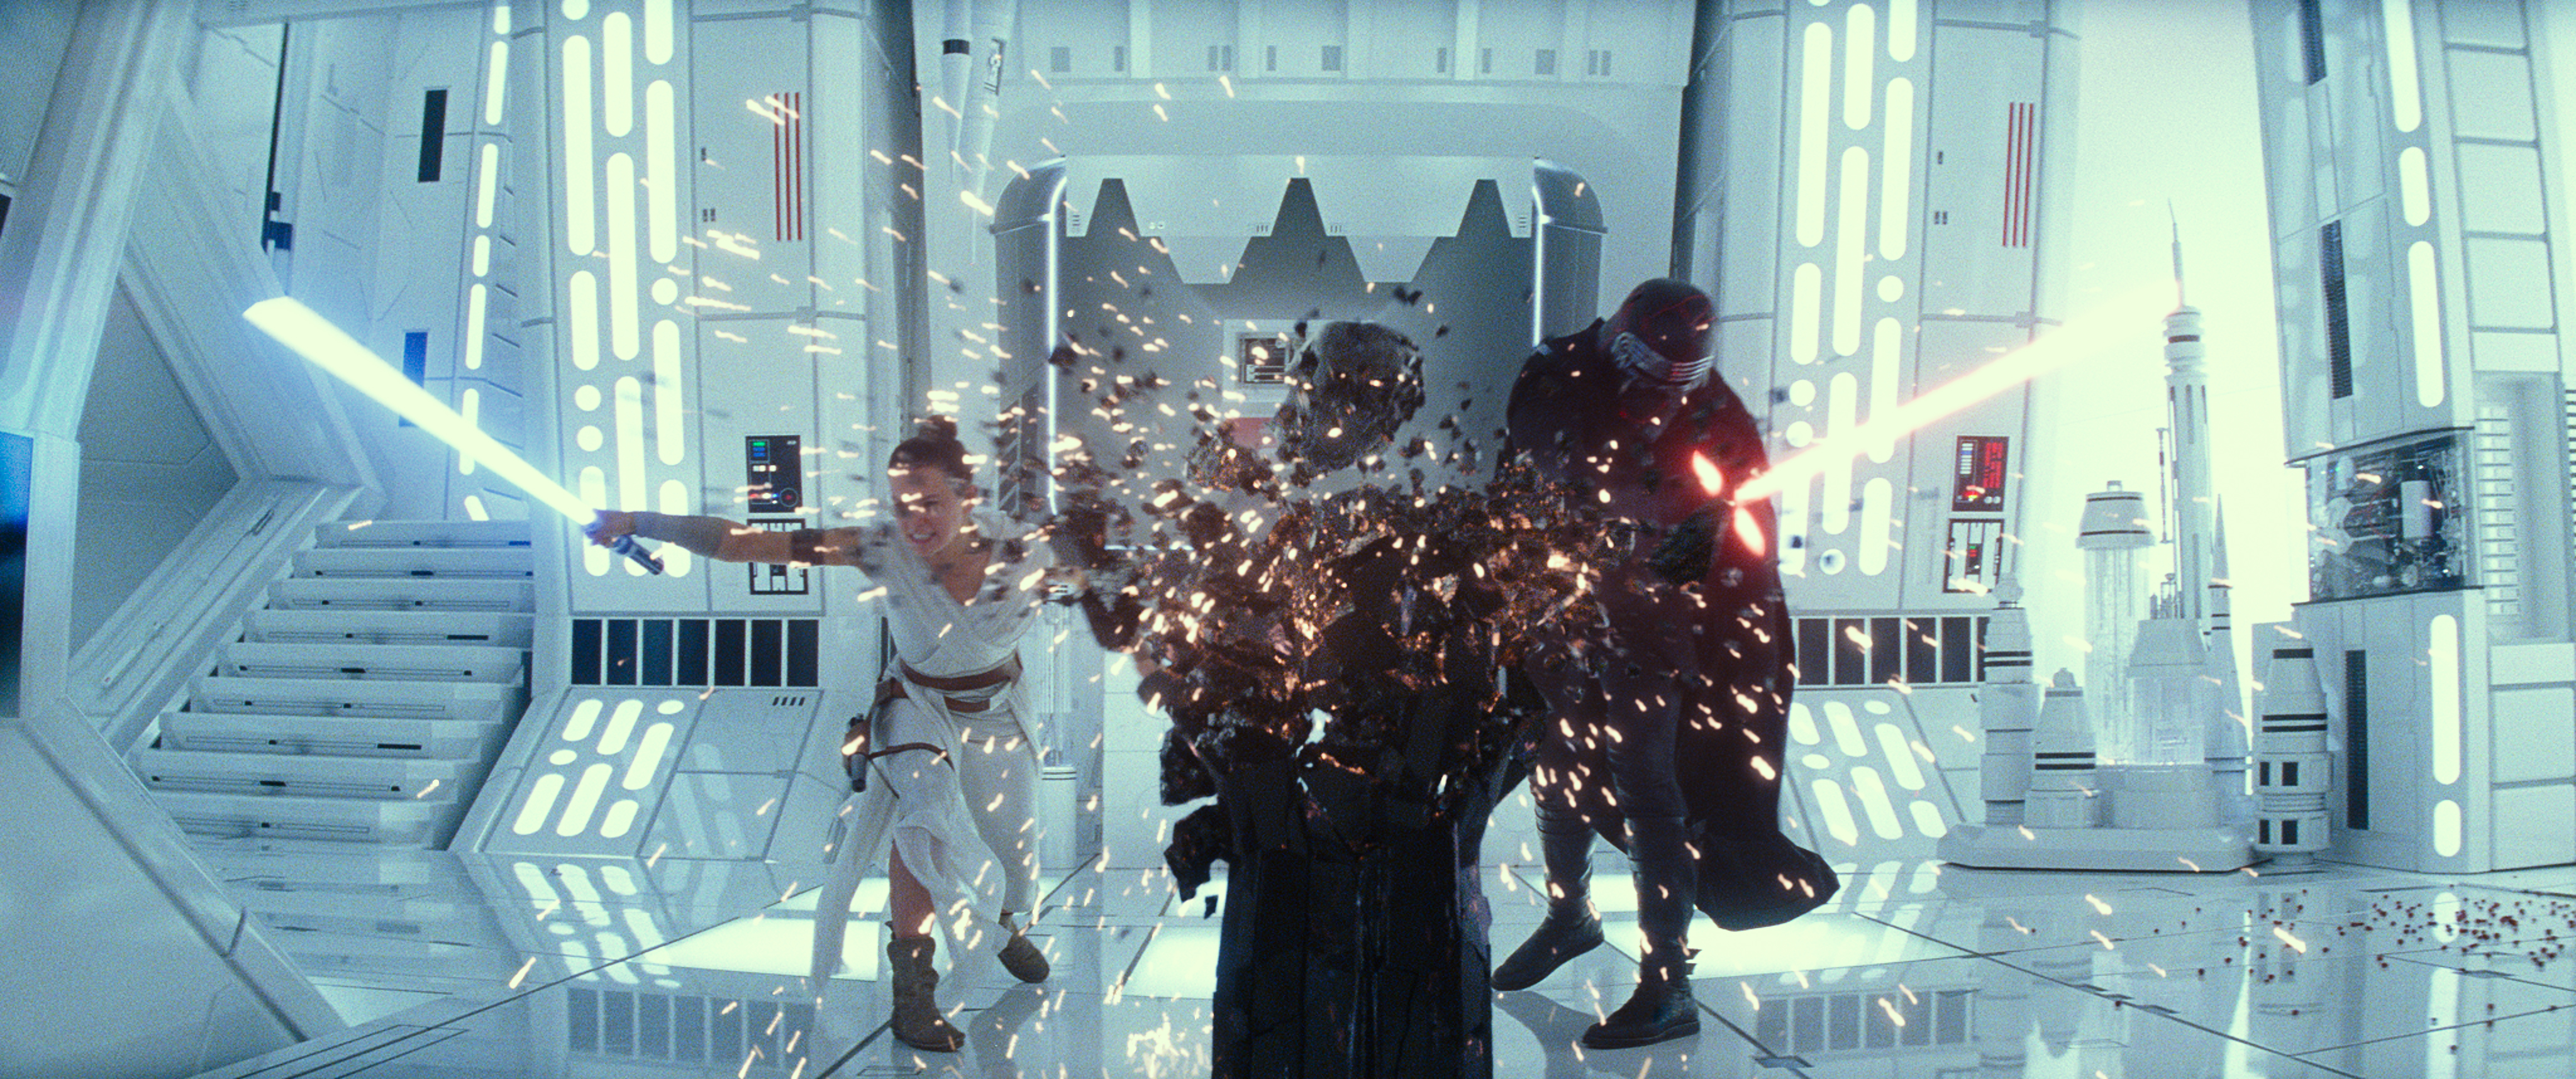 Force-bond battle.jpg